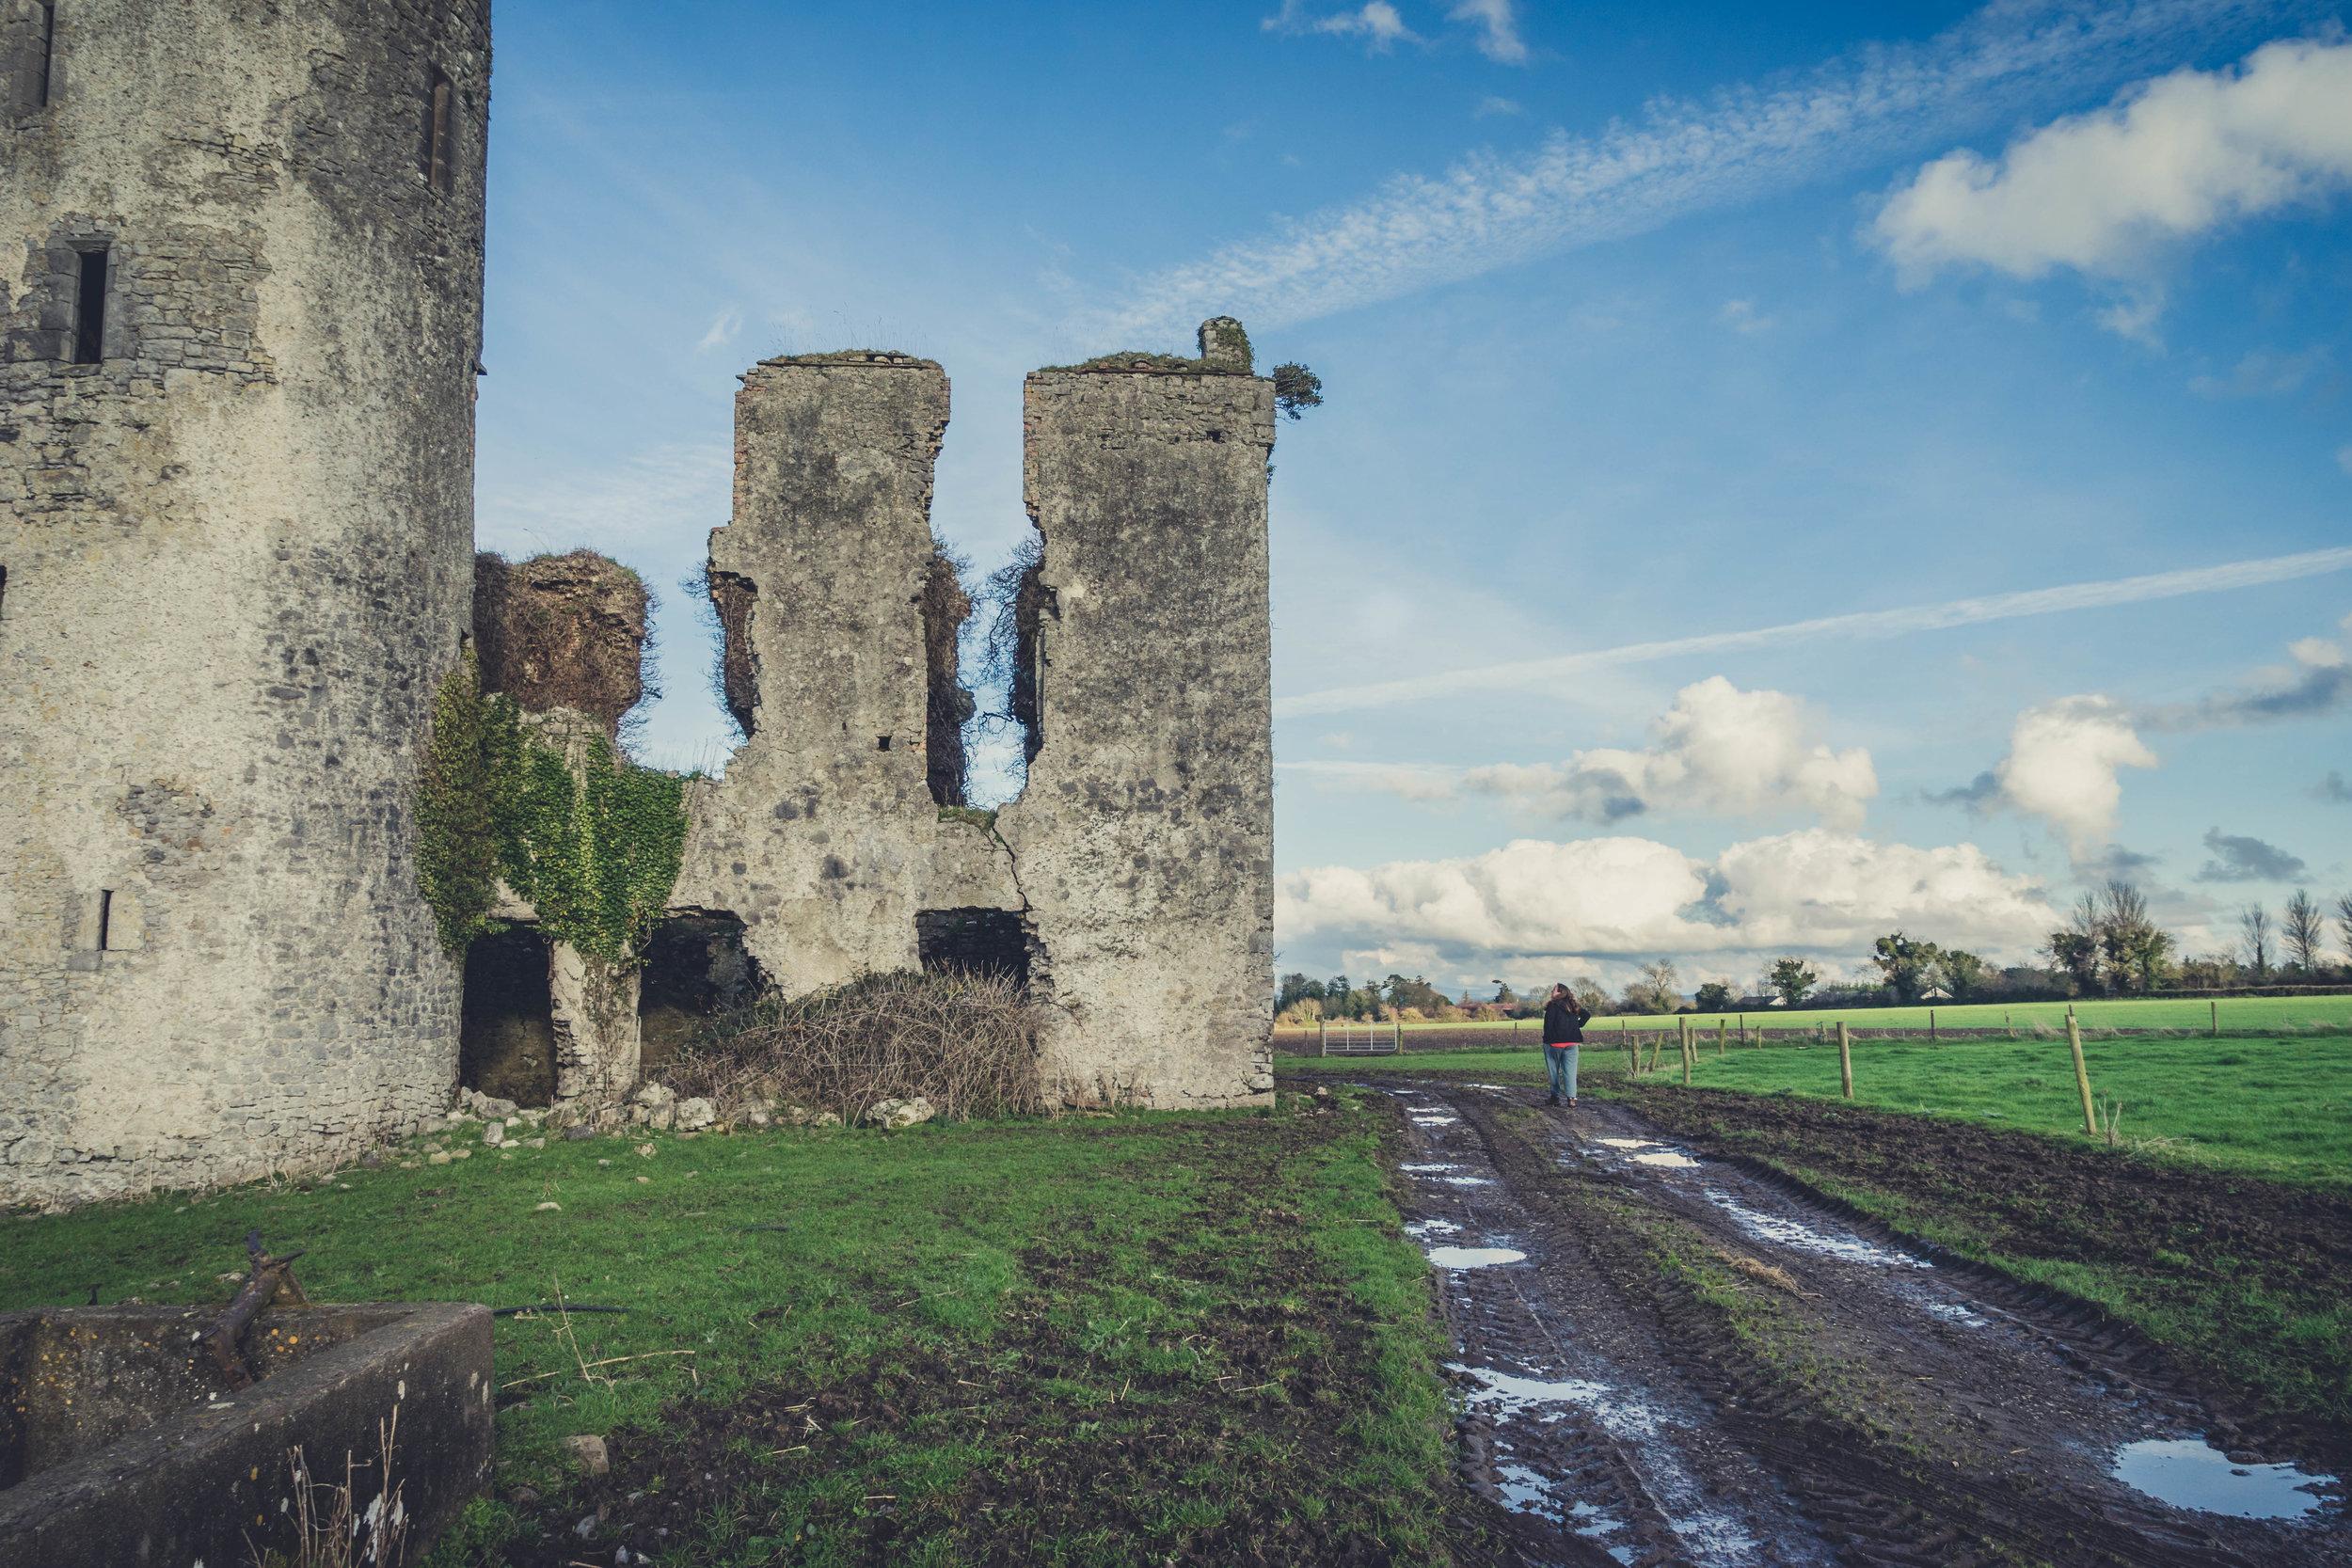 Ireland. Castle. Old castle. irish history. history. Rock of Dunamase. blue sky. rock. pathway. adventure. travel. irish counrty. Ballyadams castle.  castle walls.jpg